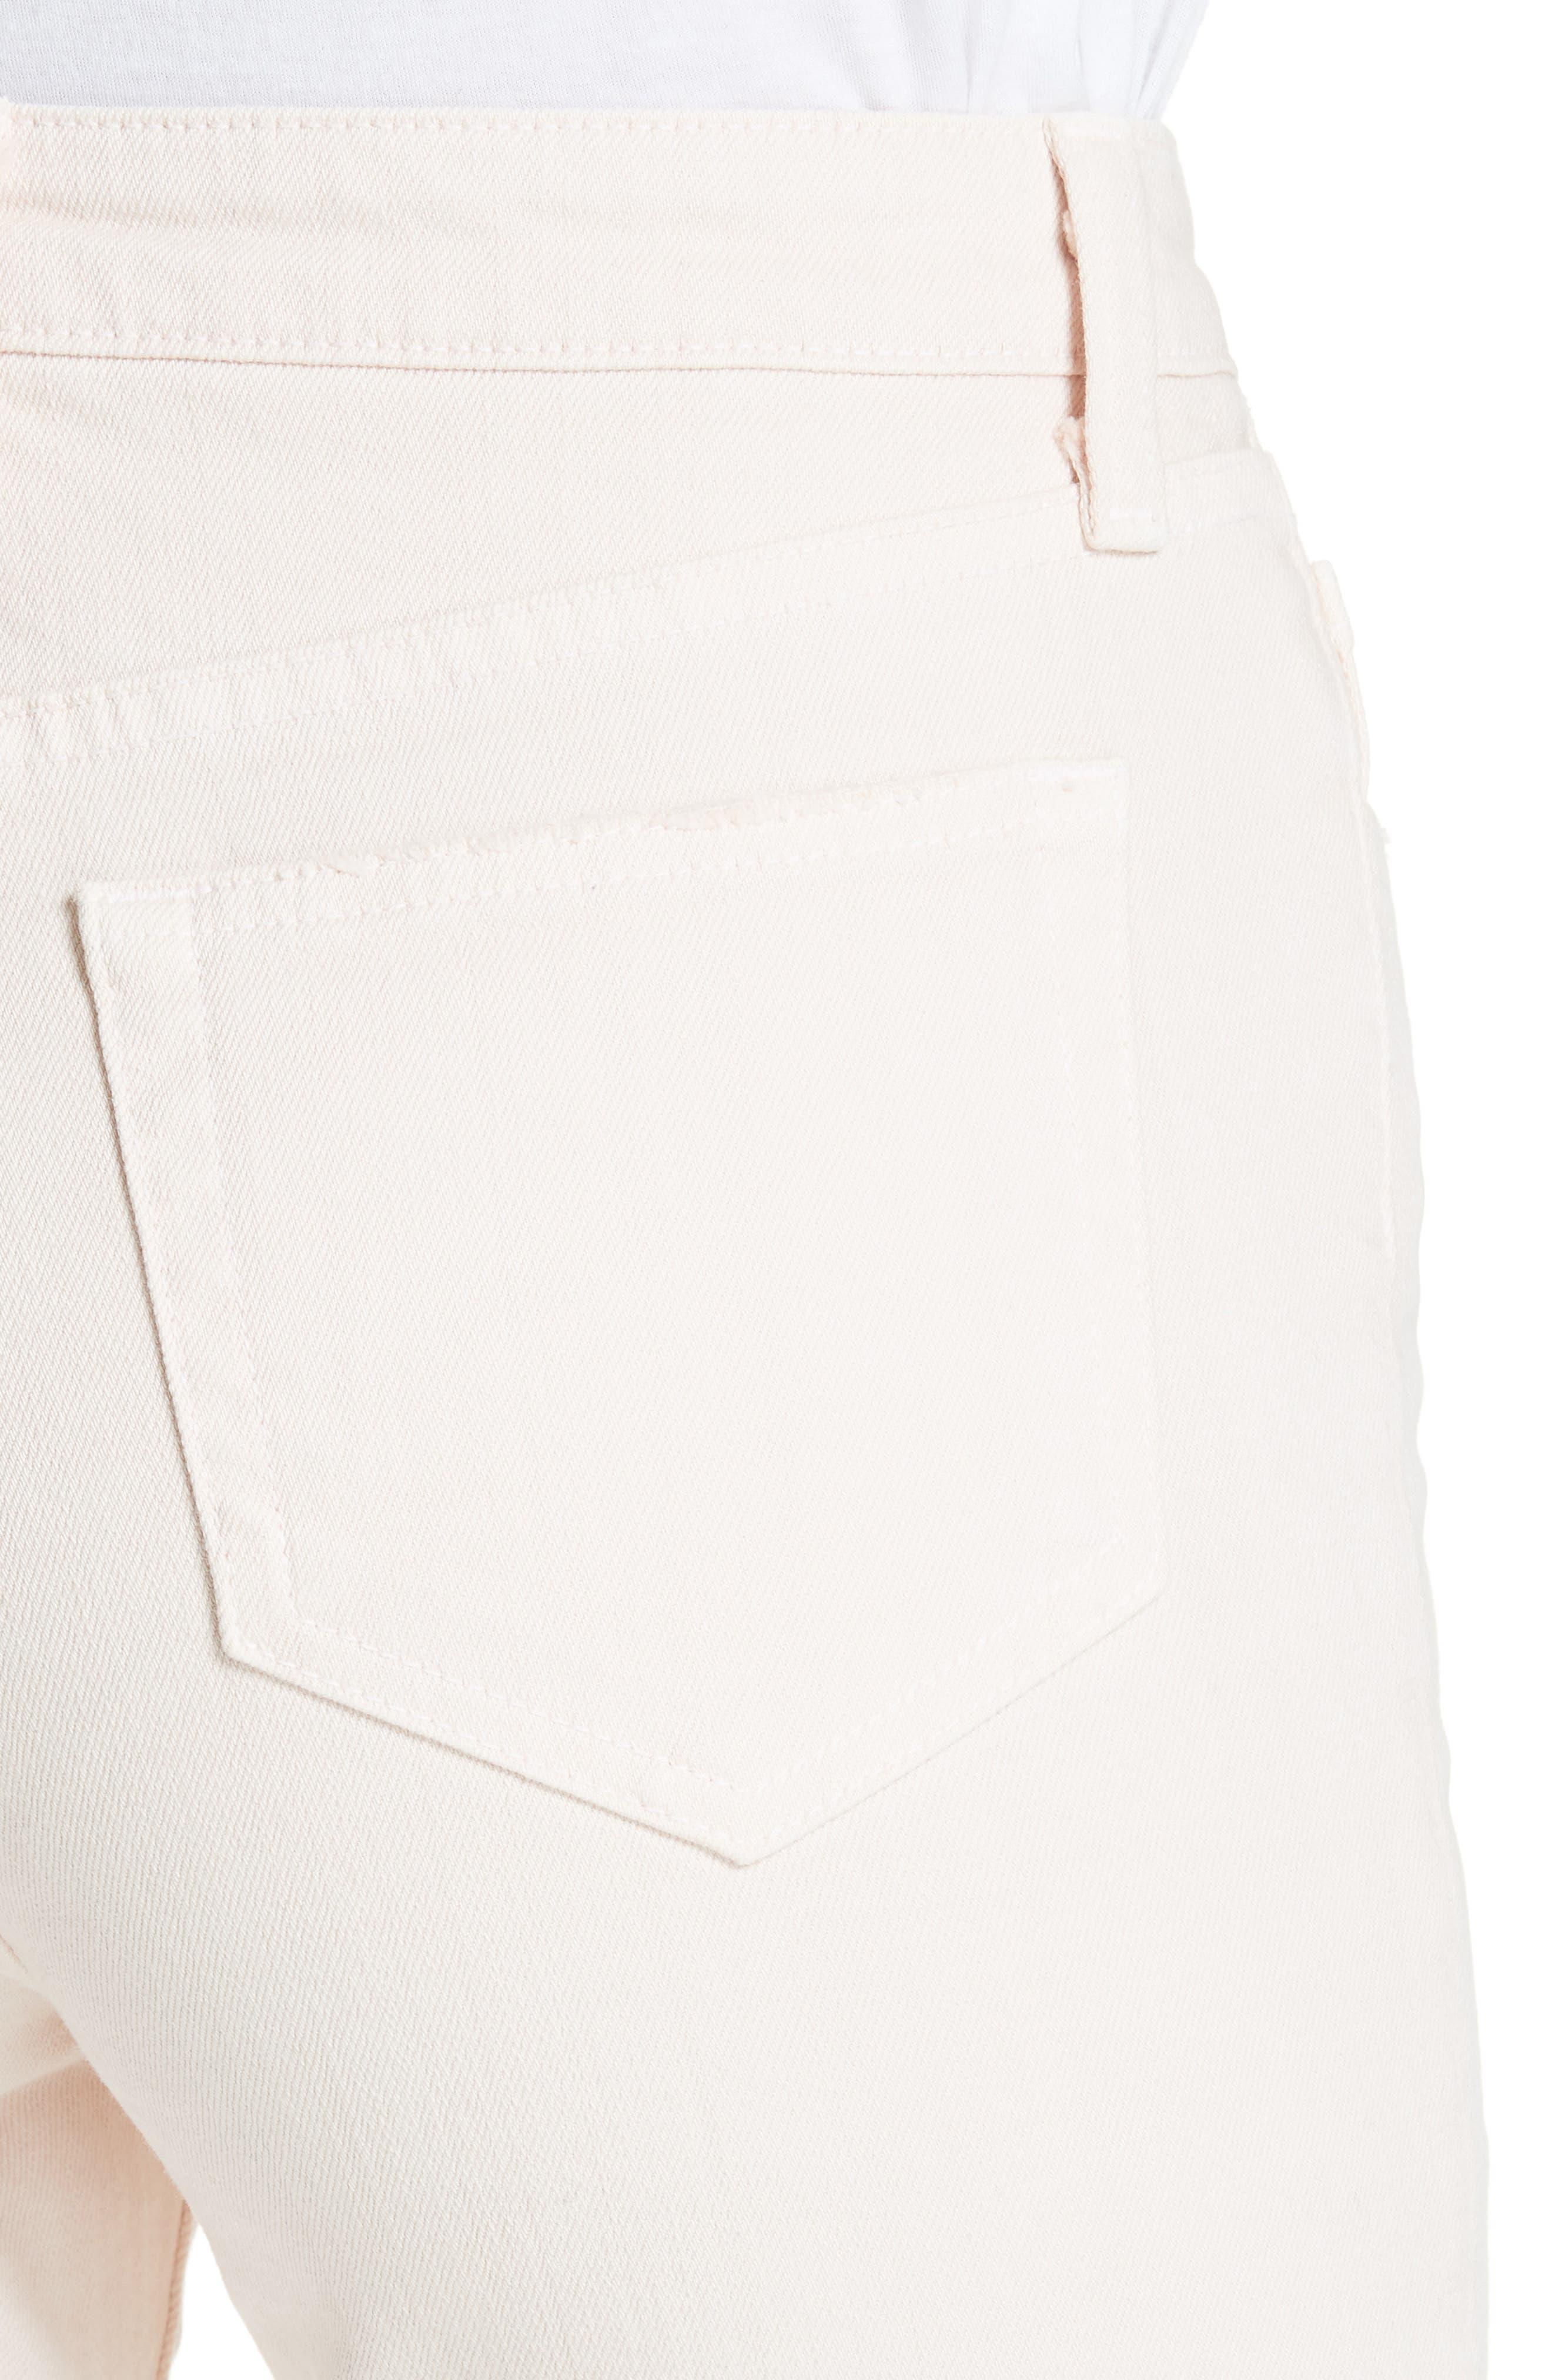 Audrina Ripped Straight Leg Crop Jeans,                             Alternate thumbnail 4, color,                             Quartz Worn Destruct